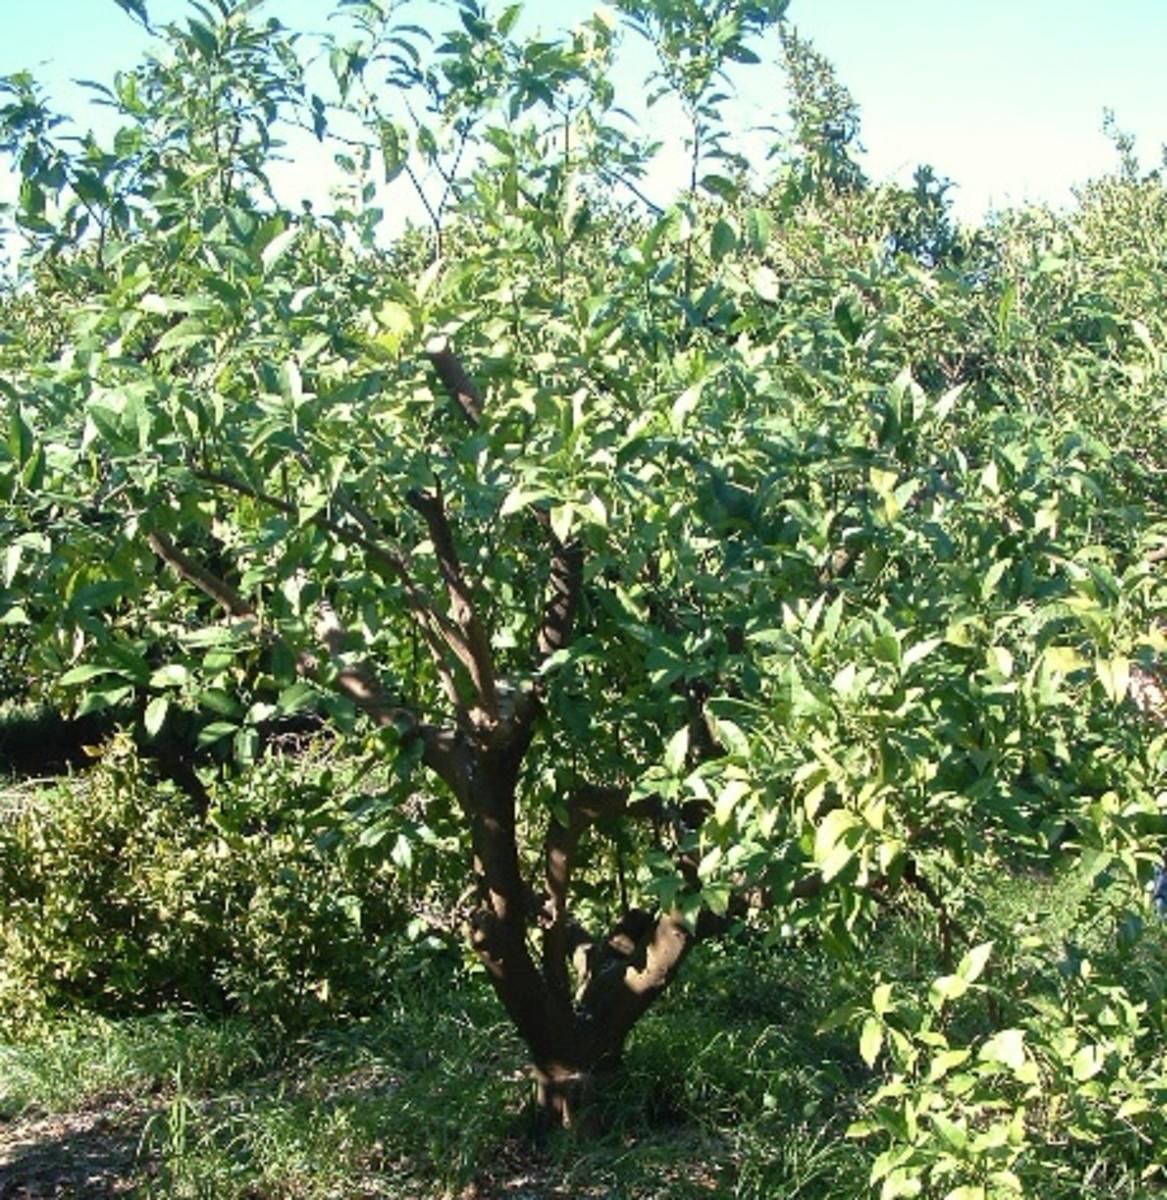 Pruned orange tree